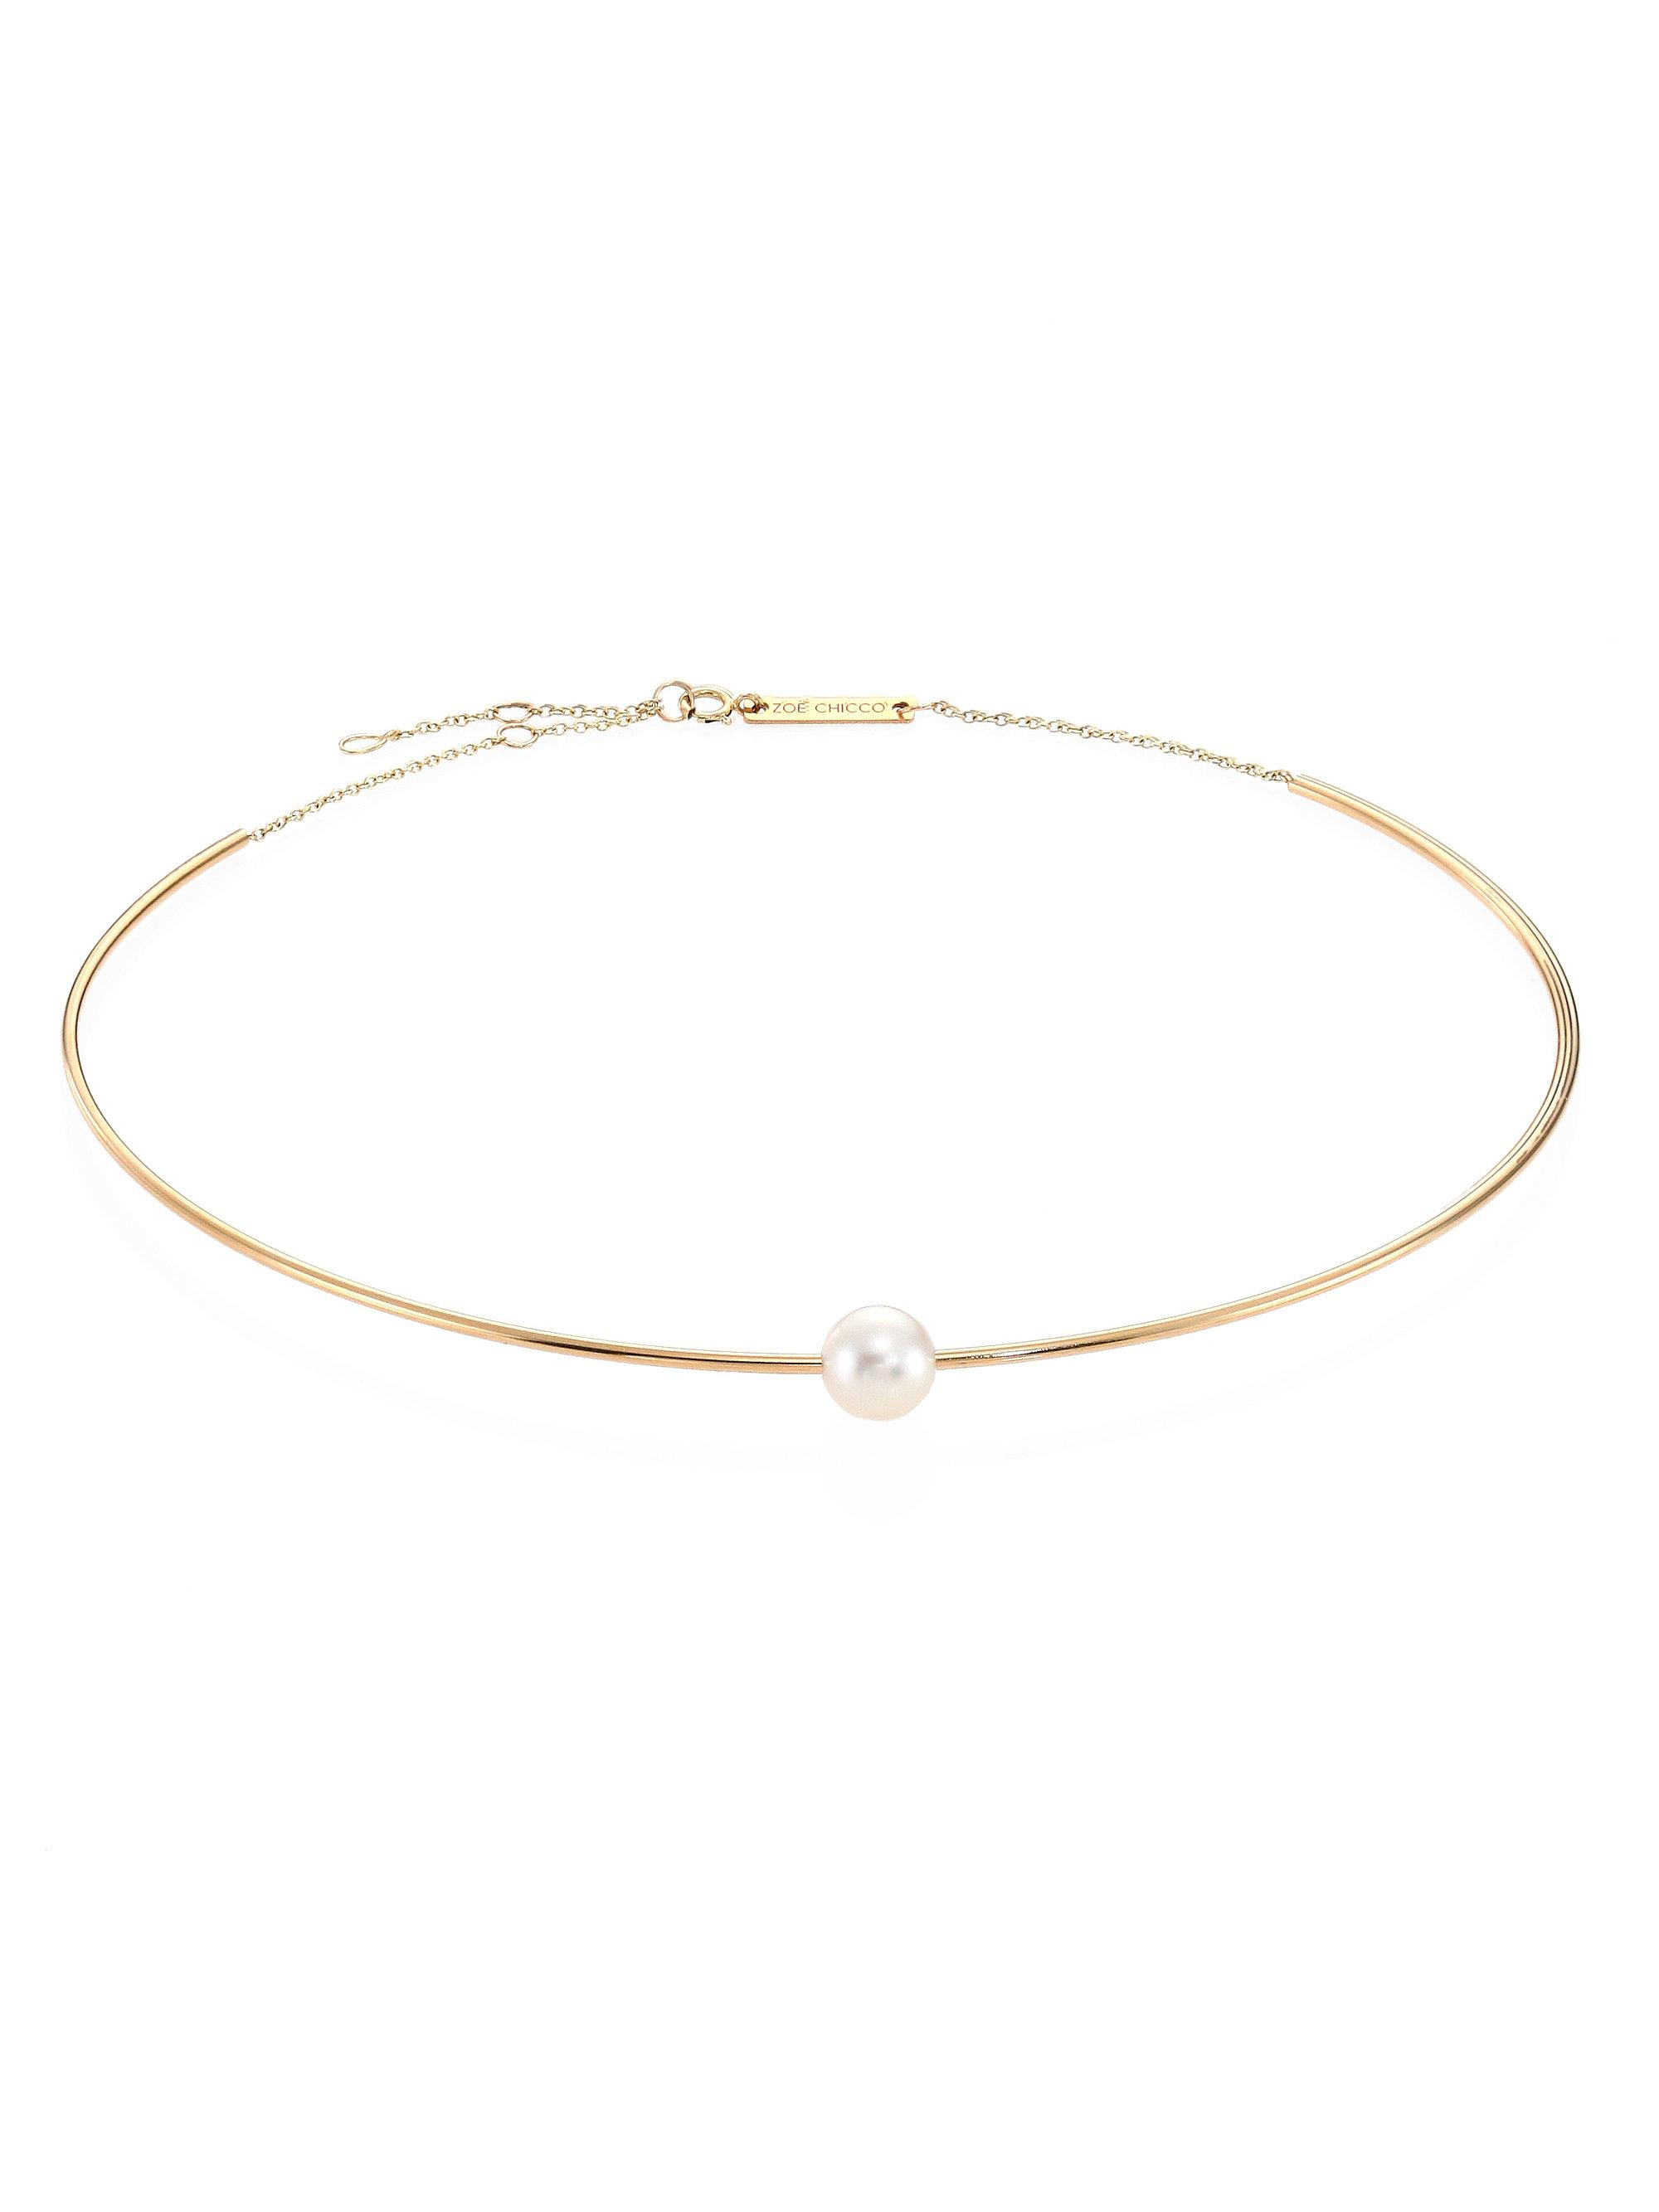 Edie Parker 14k Wire Choker Necklace 2ptoFeZ